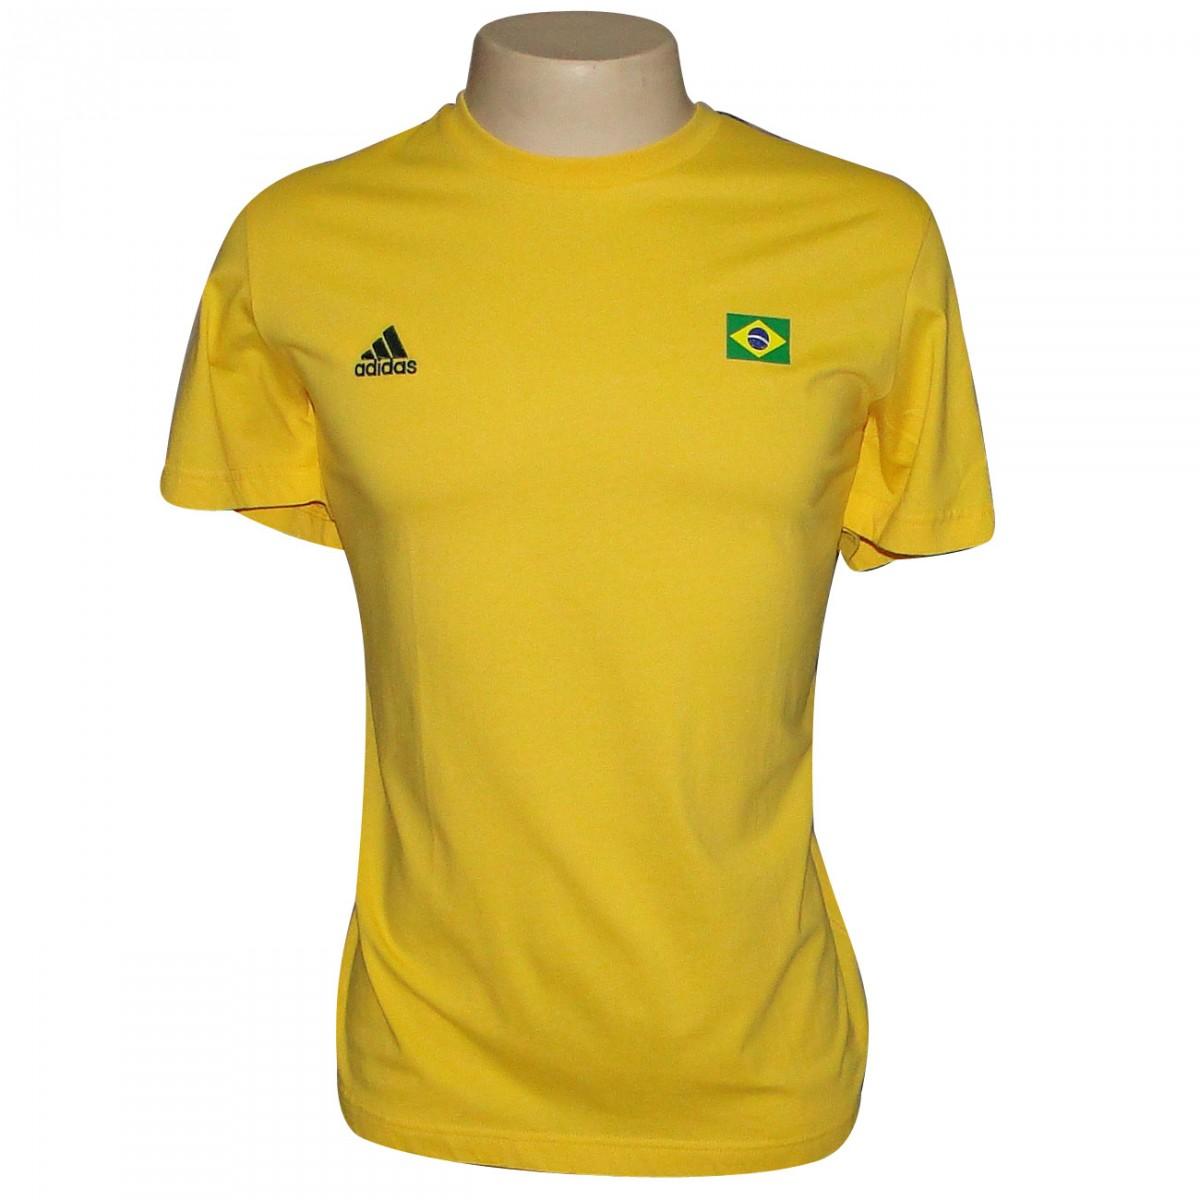 80ea1a4d01 Camiseta Adidas Brasil Ref.p98716 8968 - AMARELO VERDE - Chuteira ...